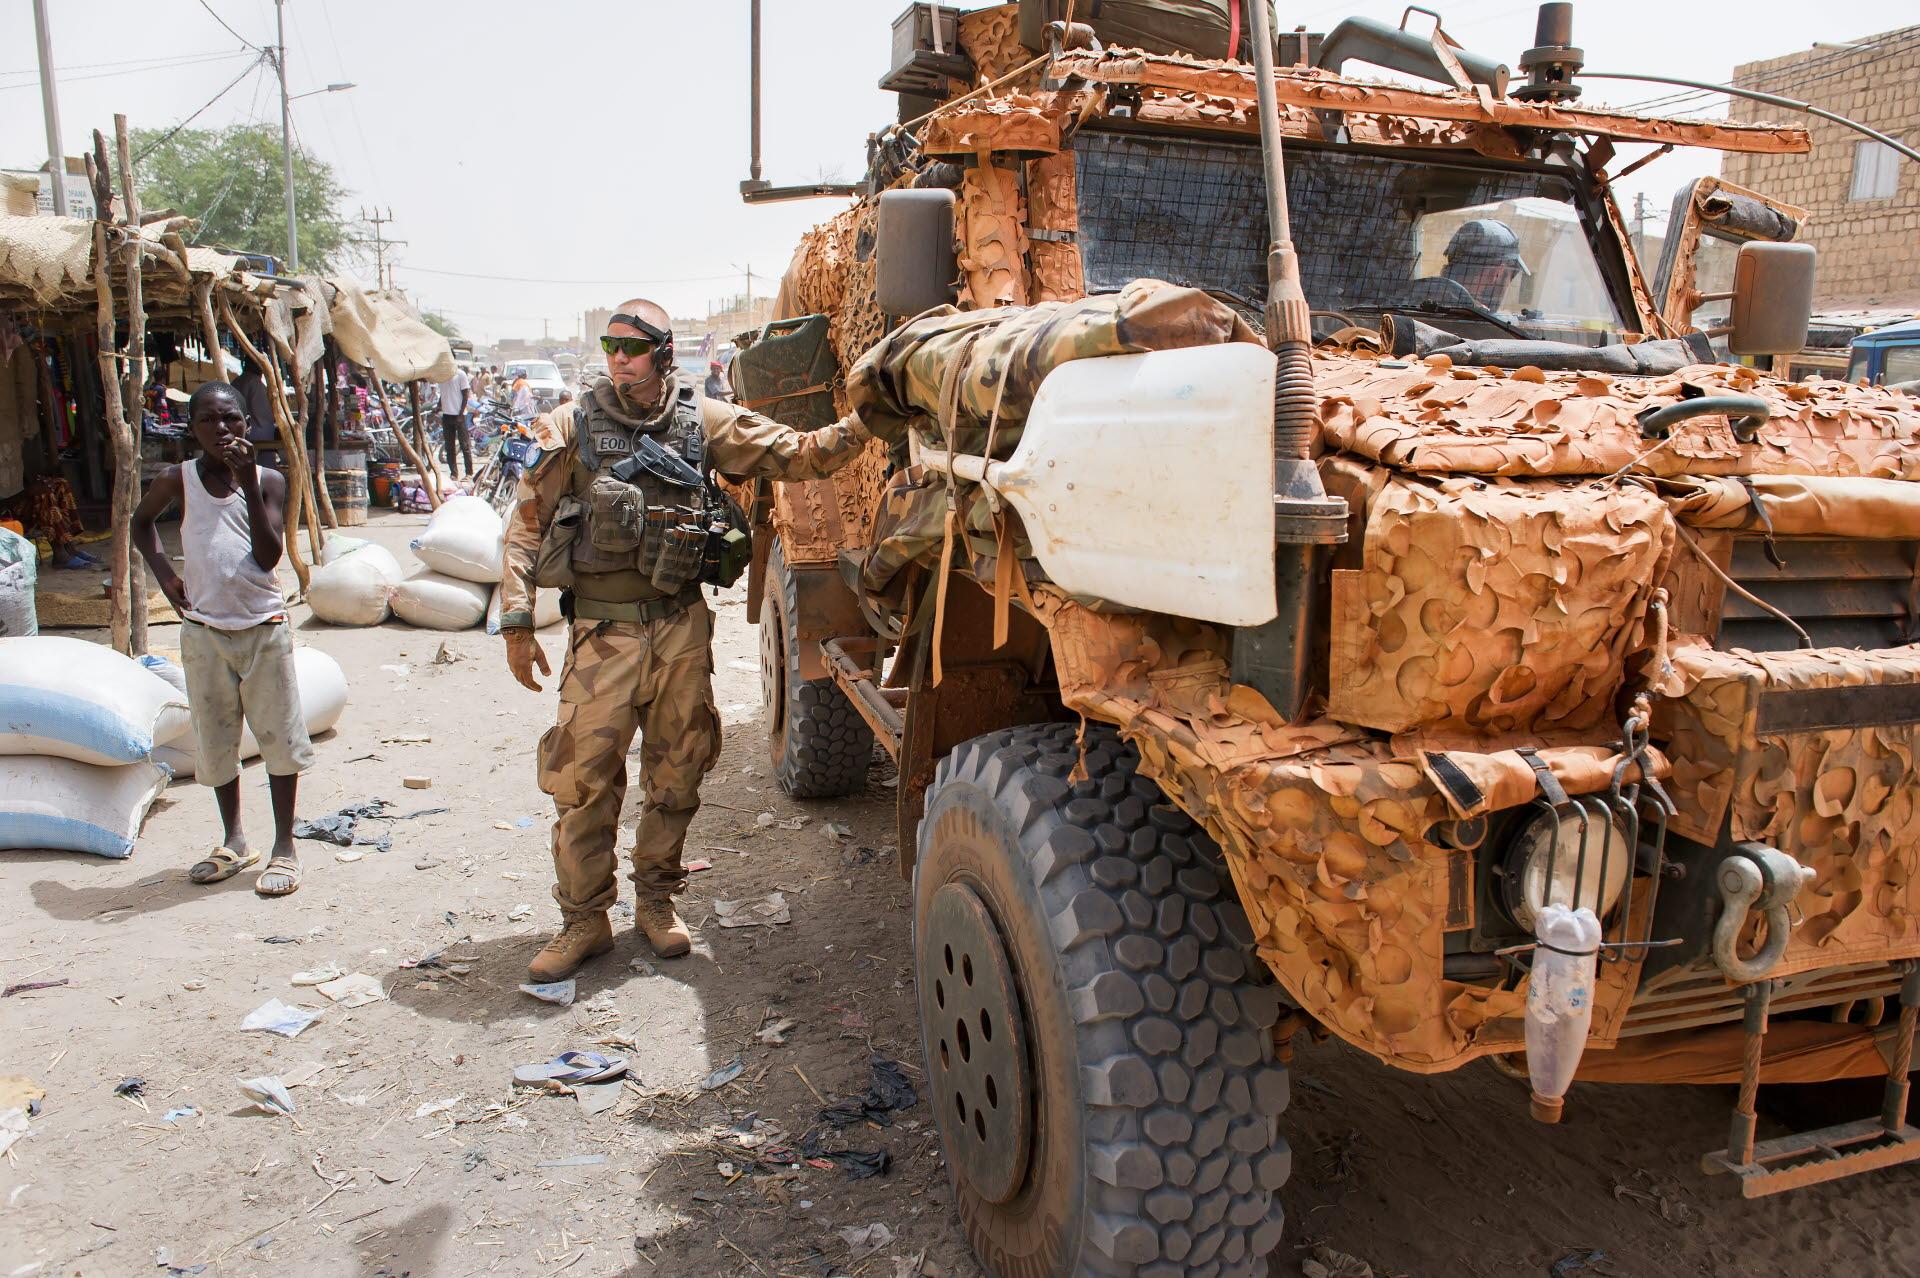 www.forsvarsmakten.se/imagevault/publishedmedia/9104avbmsas7t2xf19zt/20160501_annnor11_Mali03_Timbuktu_059.jpg